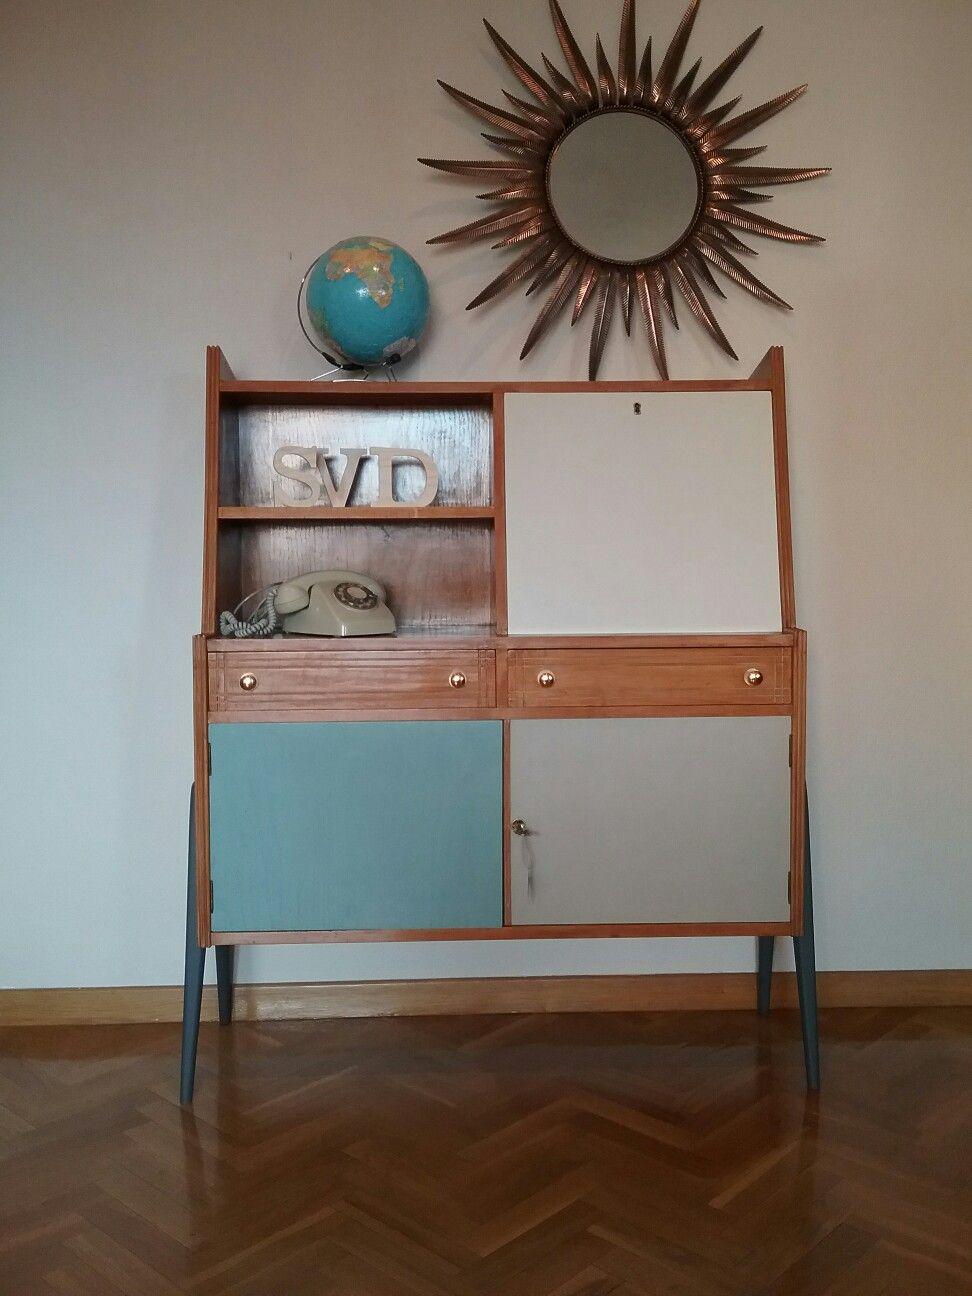 Aparador Vintage Espa A Circa A Os 50 Dise O N Rdico Restaurado  # Muebles Mocholi